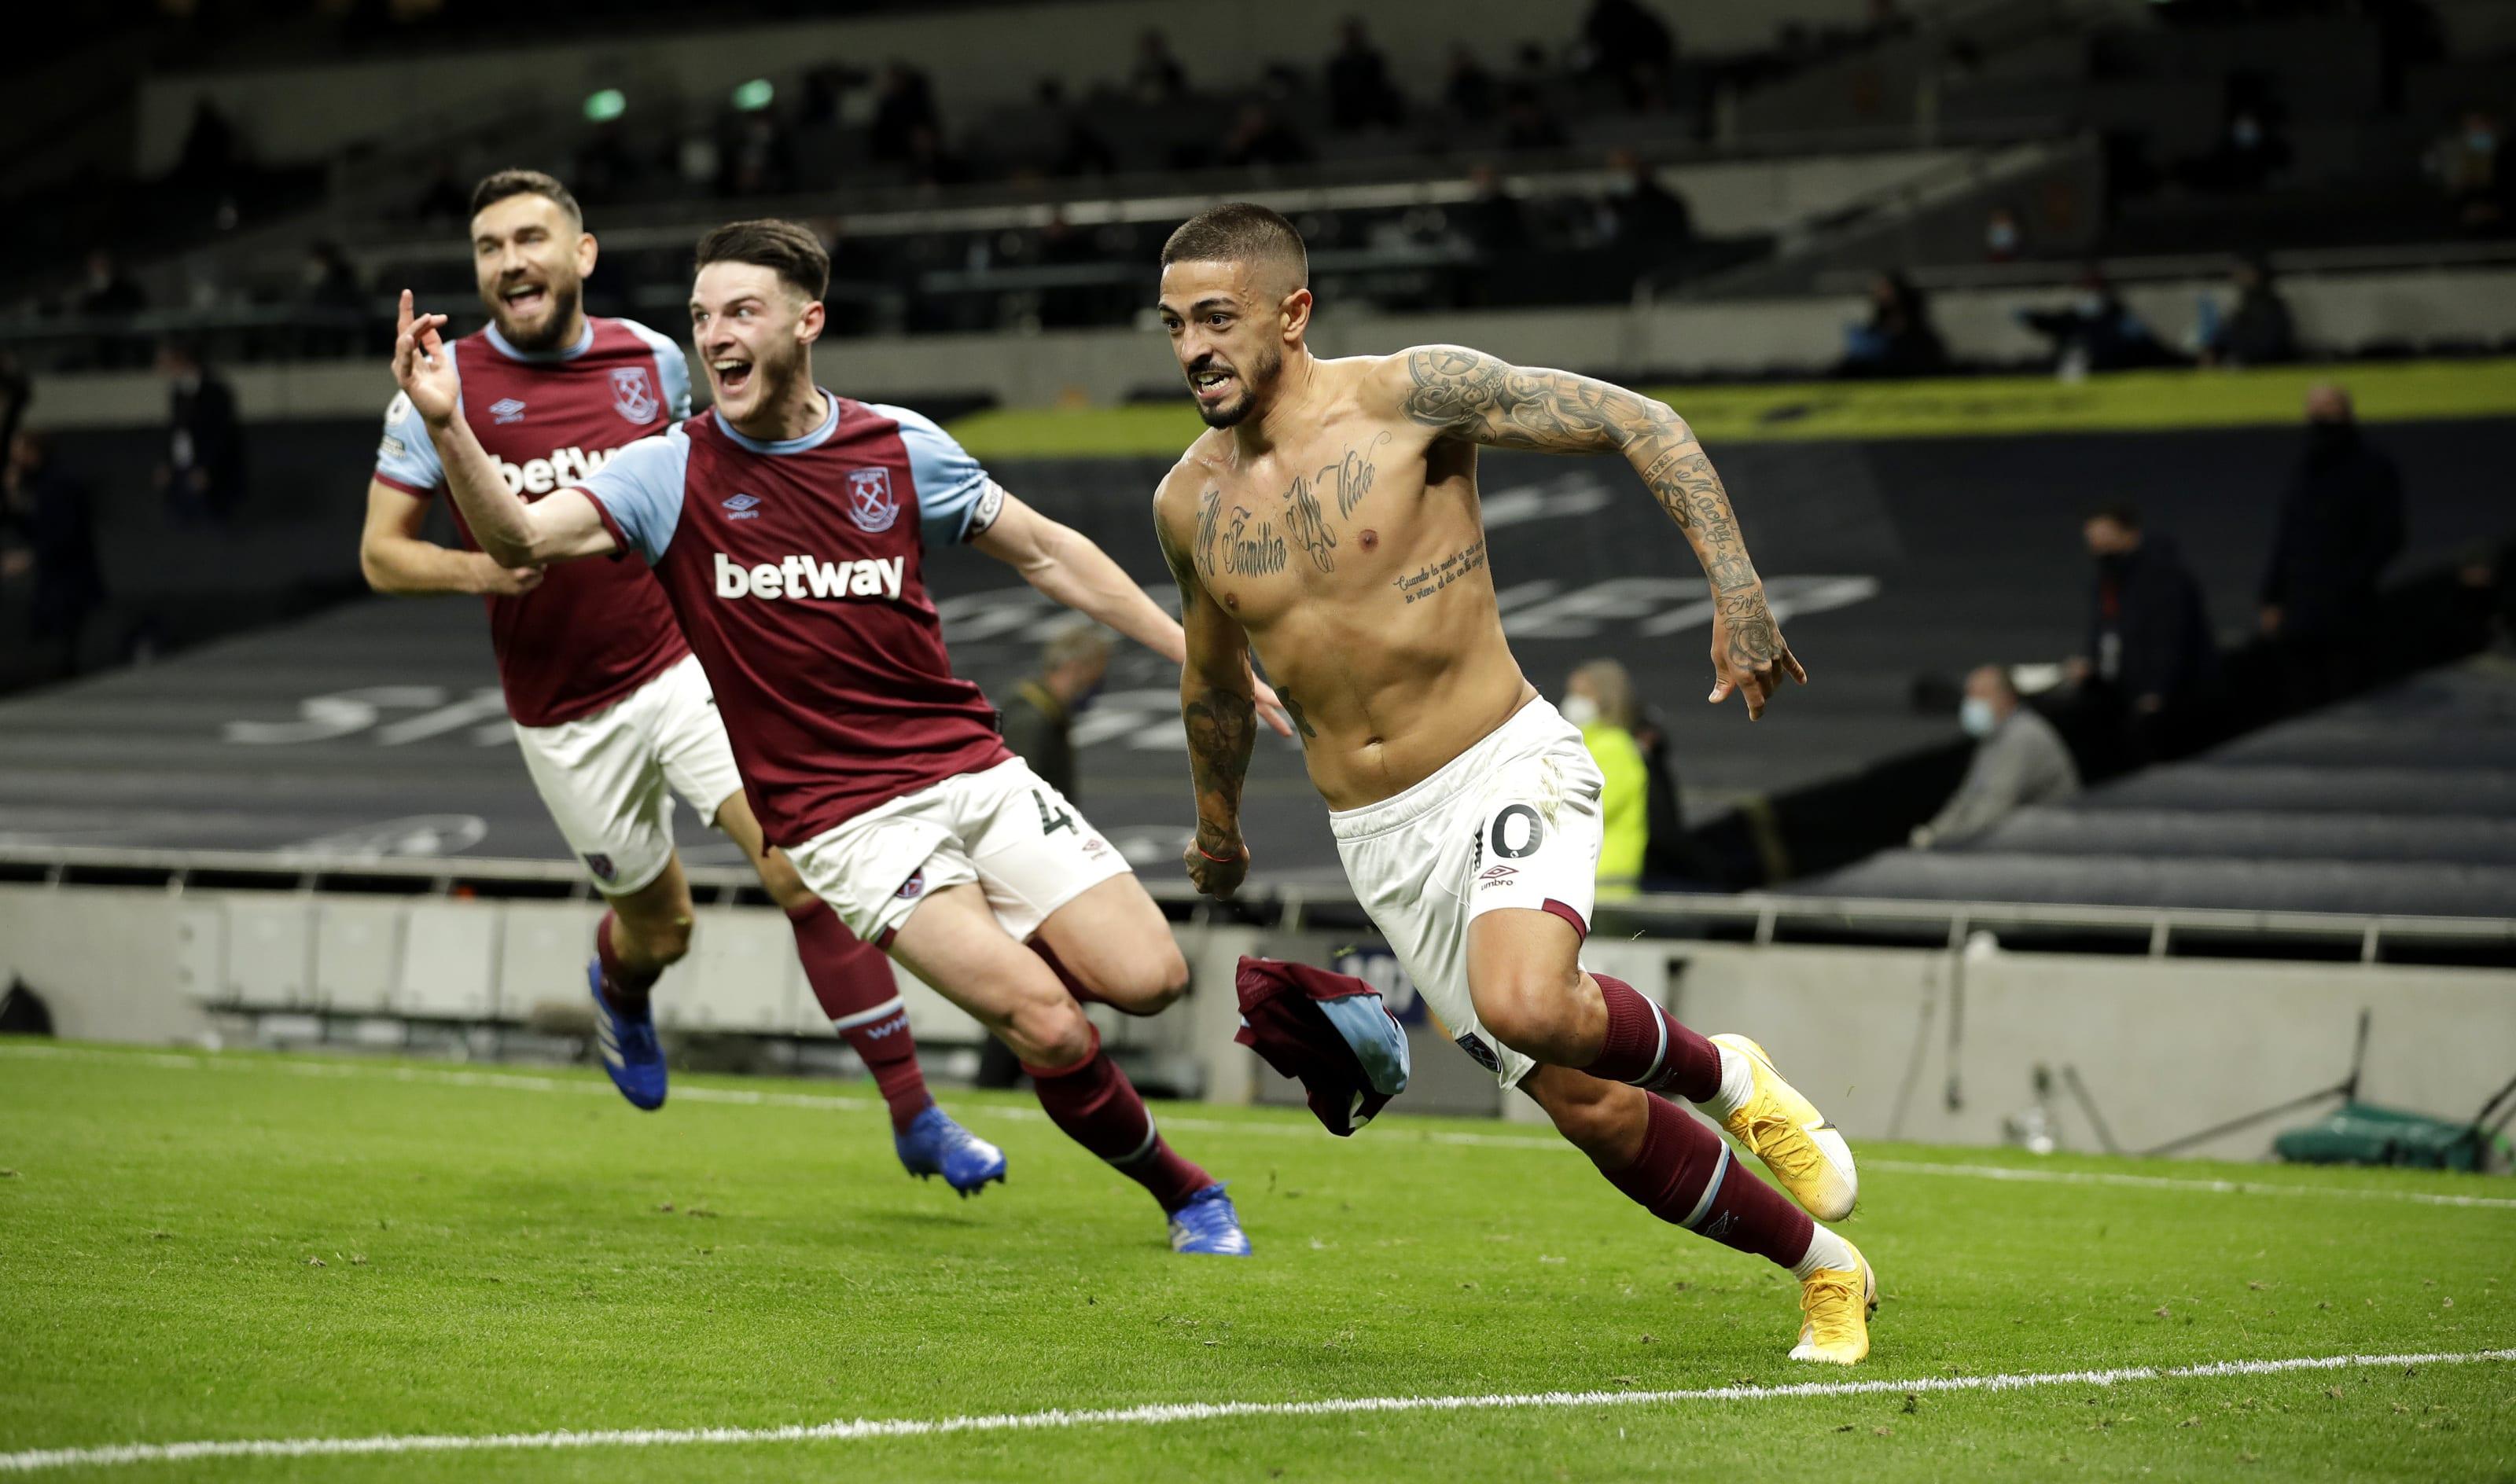 Manuel Lanzini of West Ham United celebrates. (Photo by Matt Dunham - Pool/Getty Images)